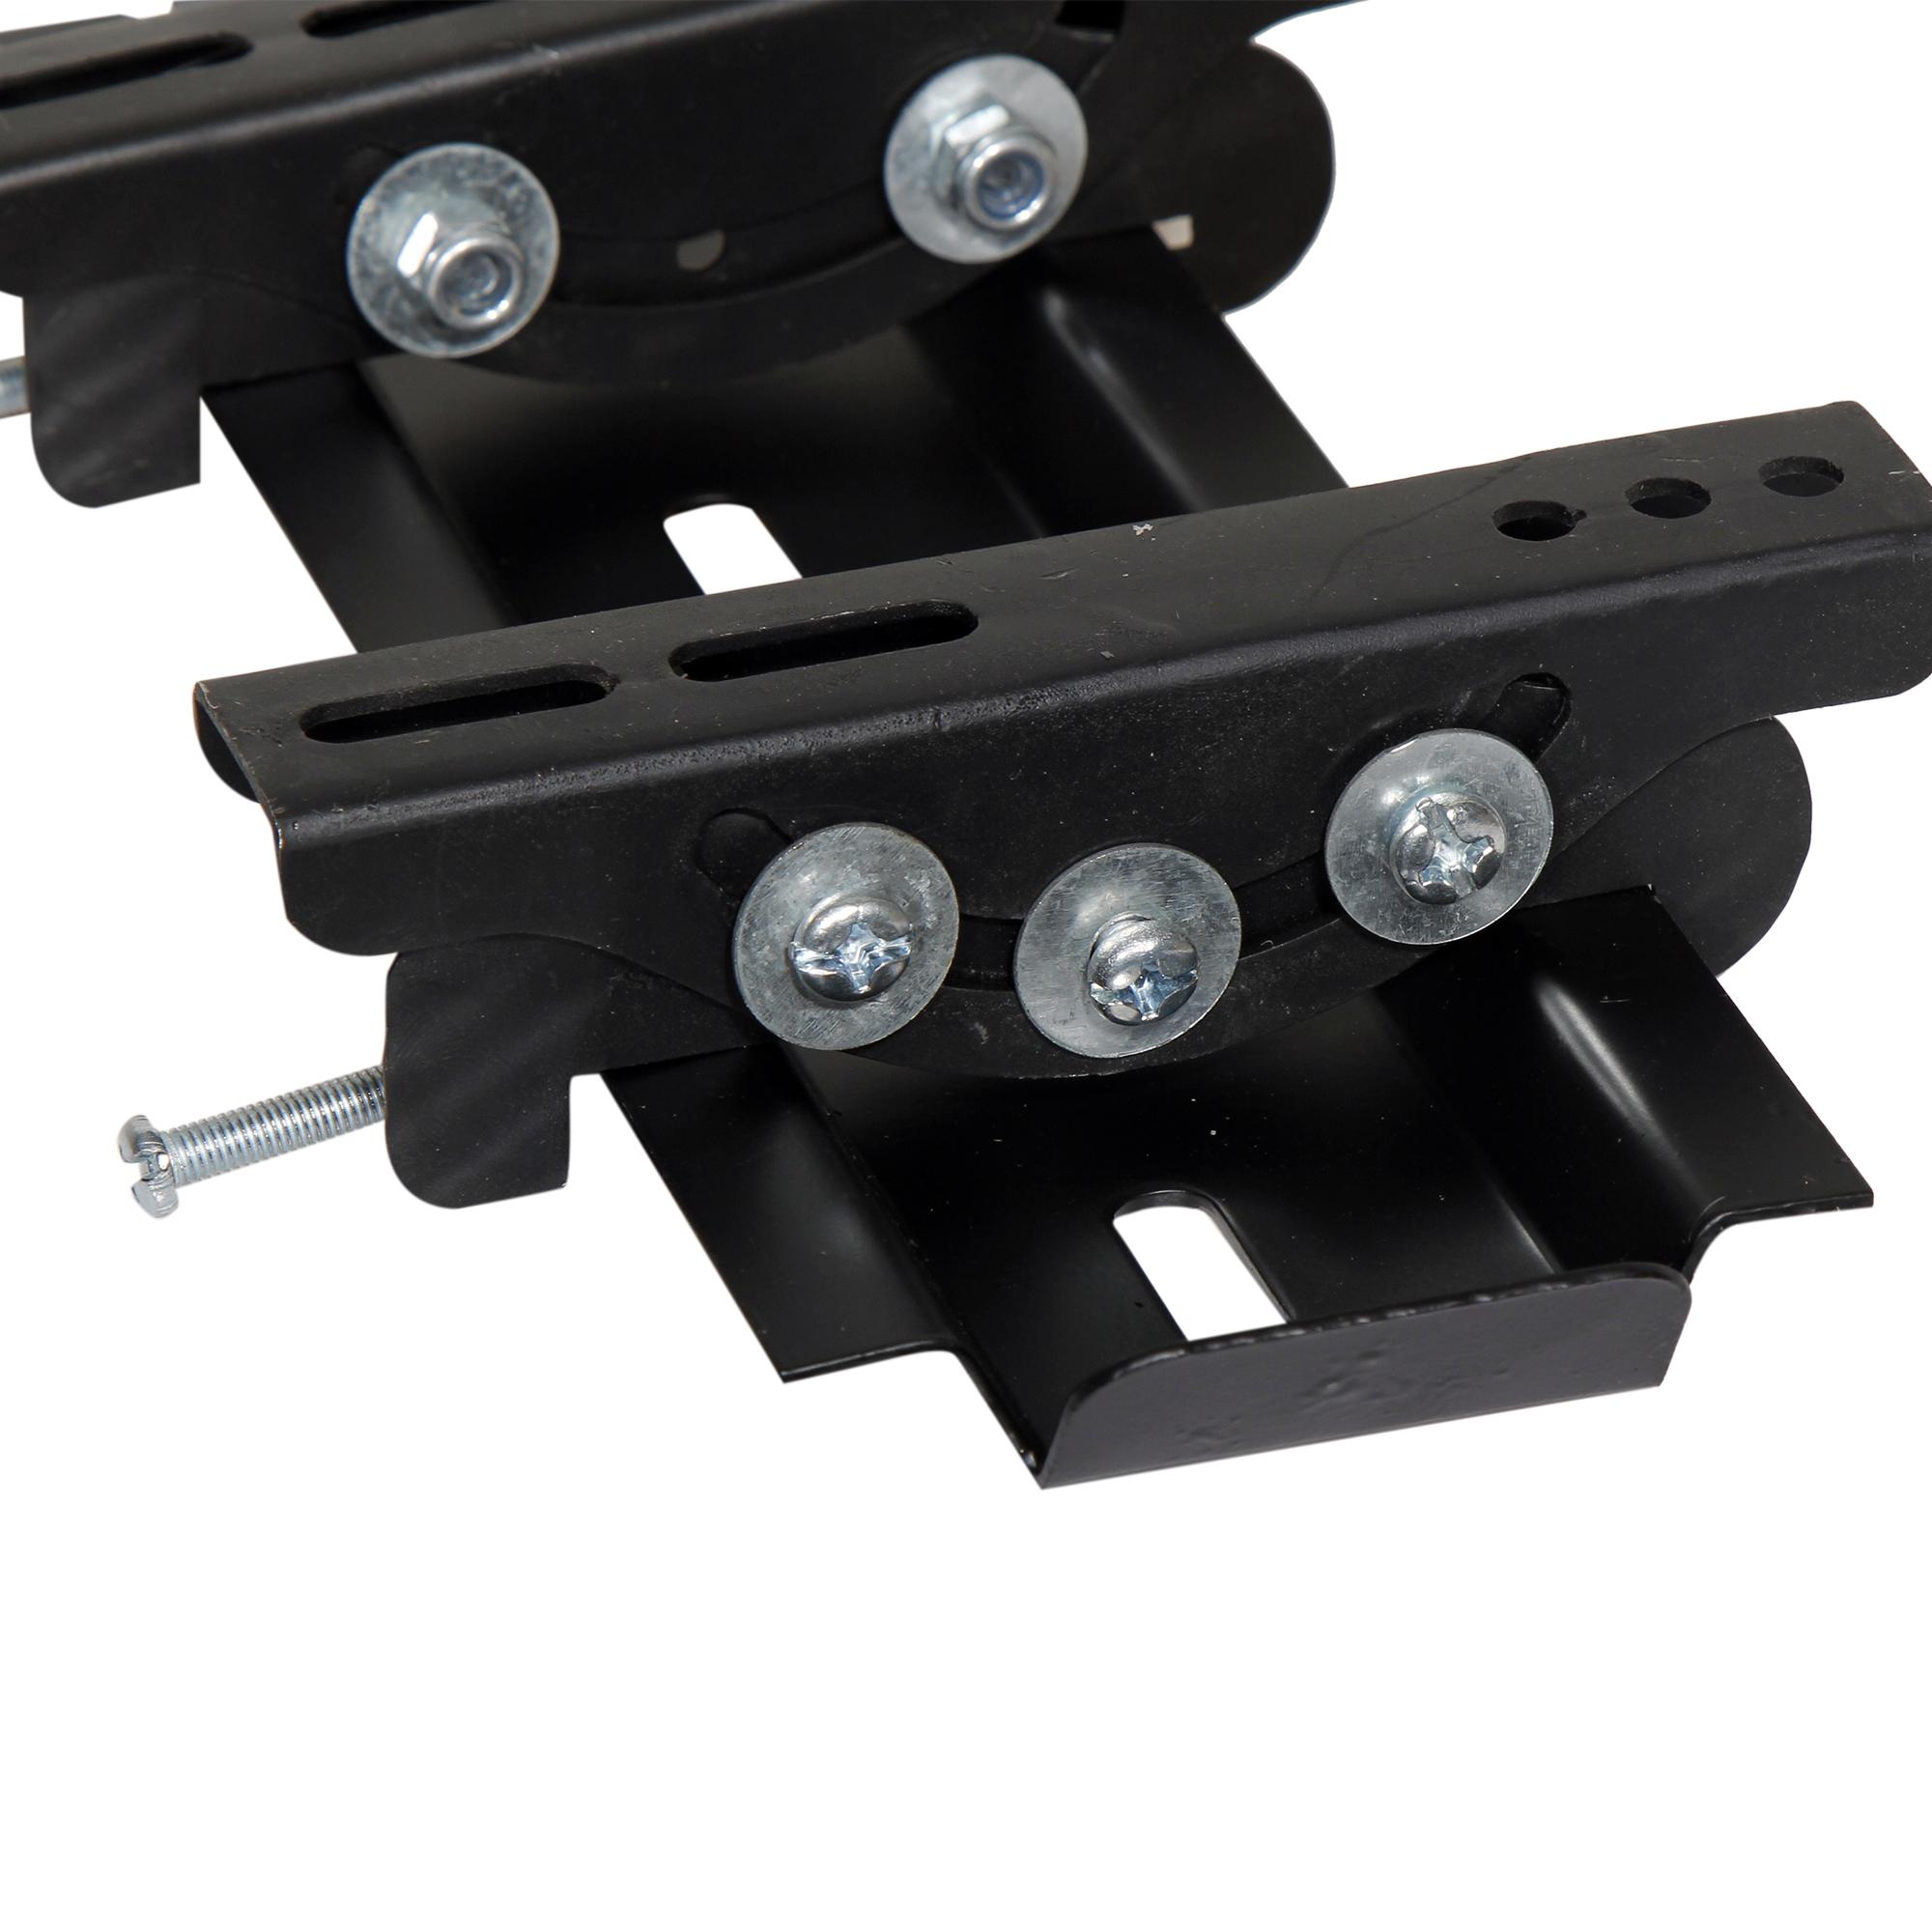 پایه دیواری تلویزیون ایفل مدل F10 مناسب برای تلویزیون  15 تا 24 اینچی